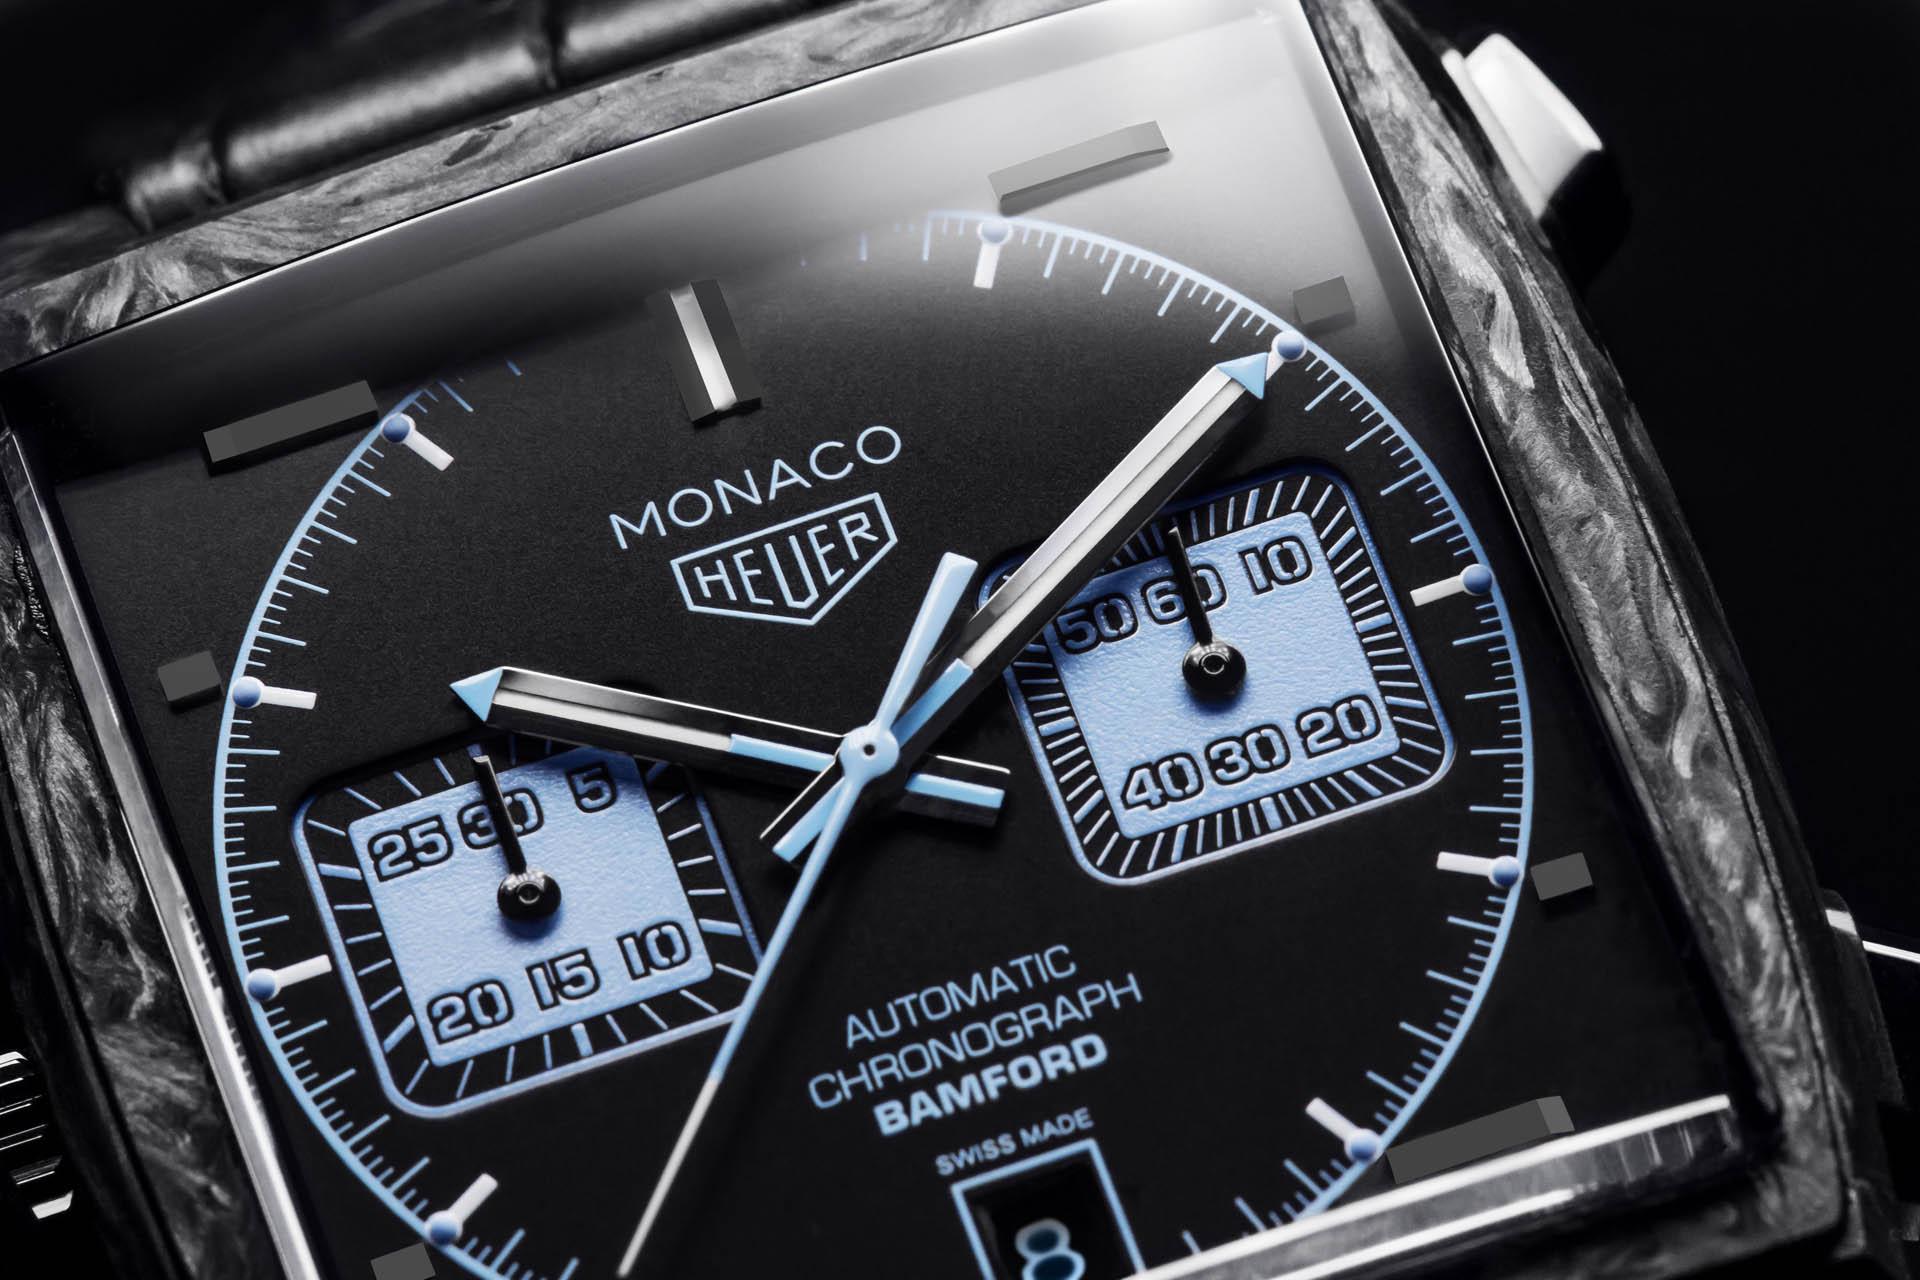 Tag Heuer Monaco Bamford Limited edition (7)